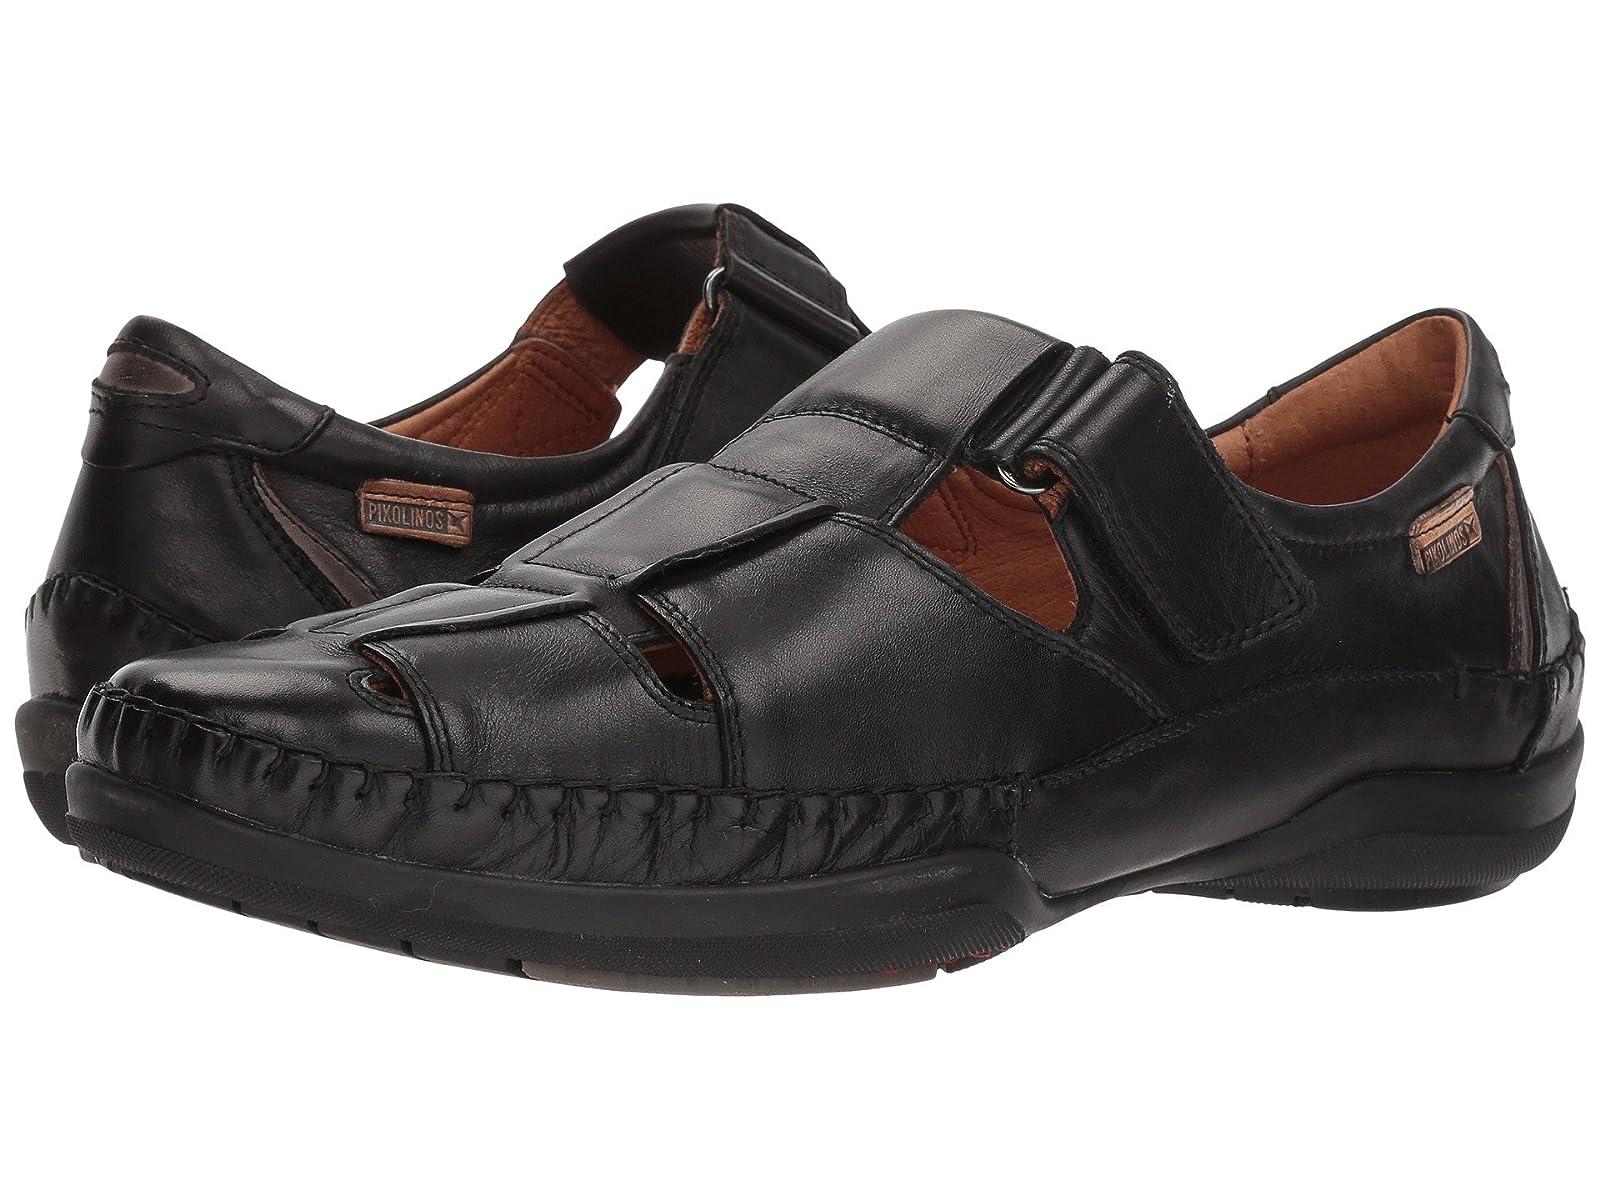 Pikolinos San Telmo M1D-1011Atmospheric grades have affordable shoes